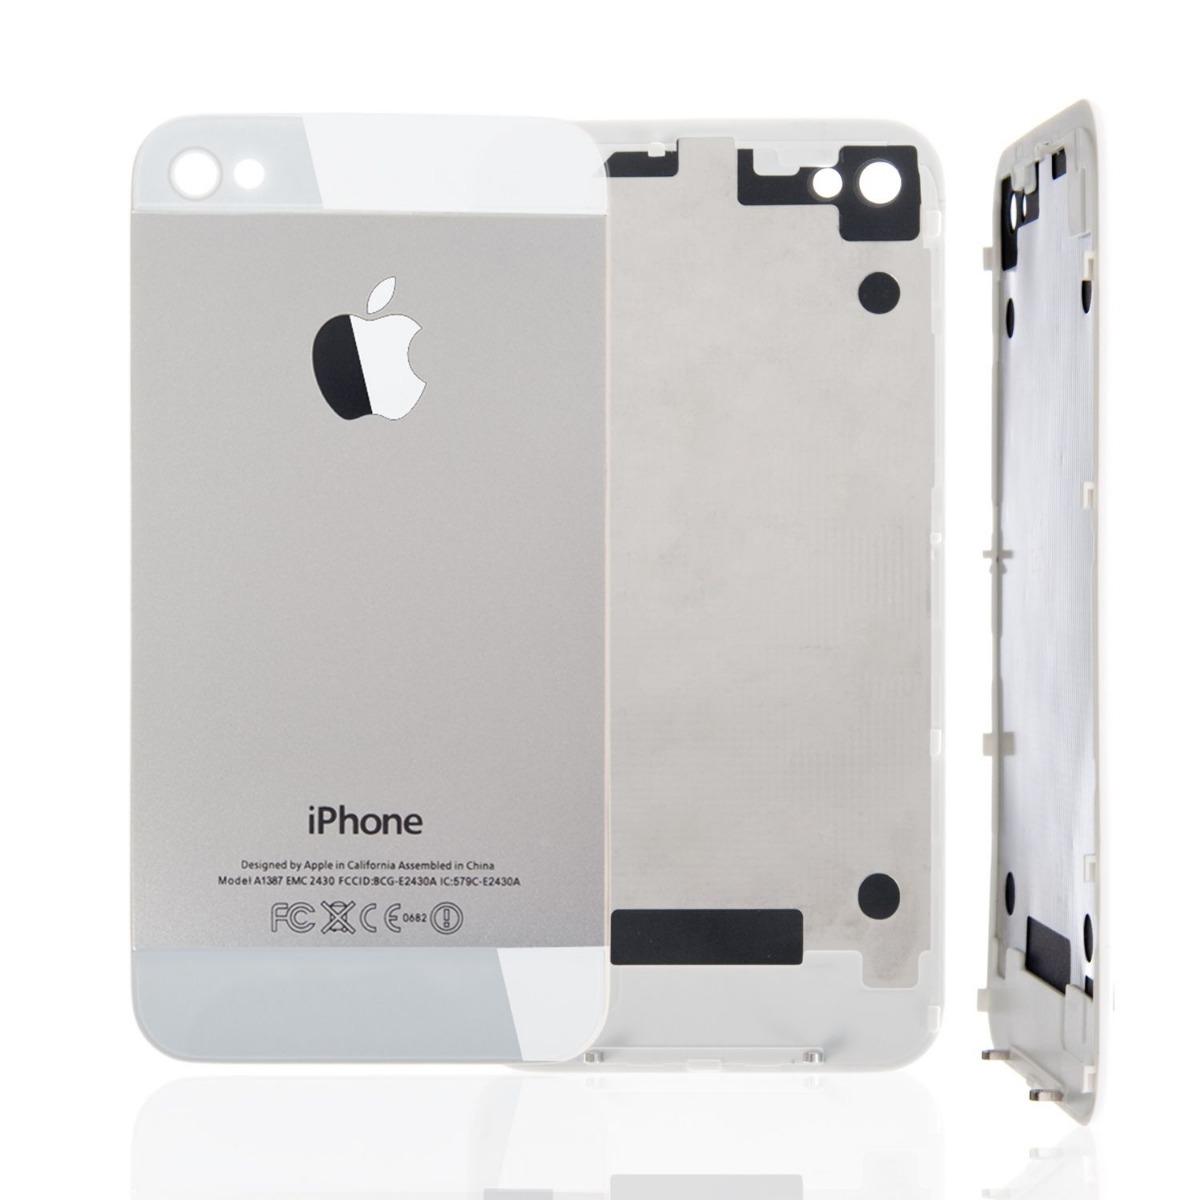 39d3f9394ec tapa trasera iphone 4 y 4s negro blanco vidrio trasero apple. Cargando zoom.